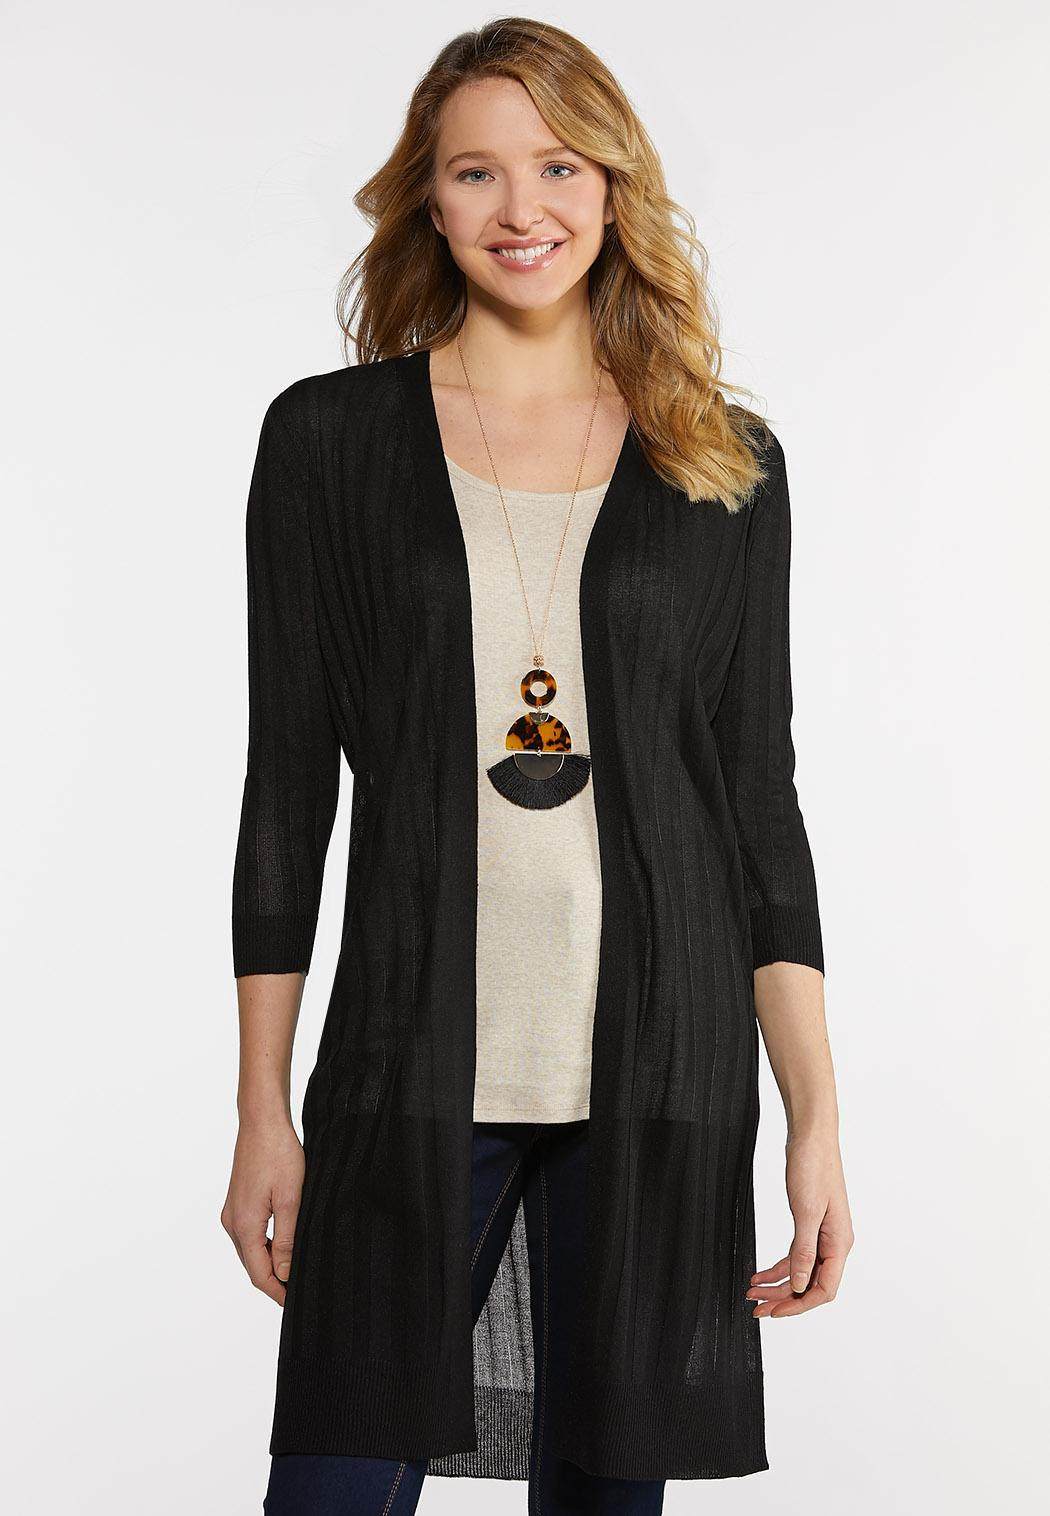 Sheer Black Cardigan Sweater